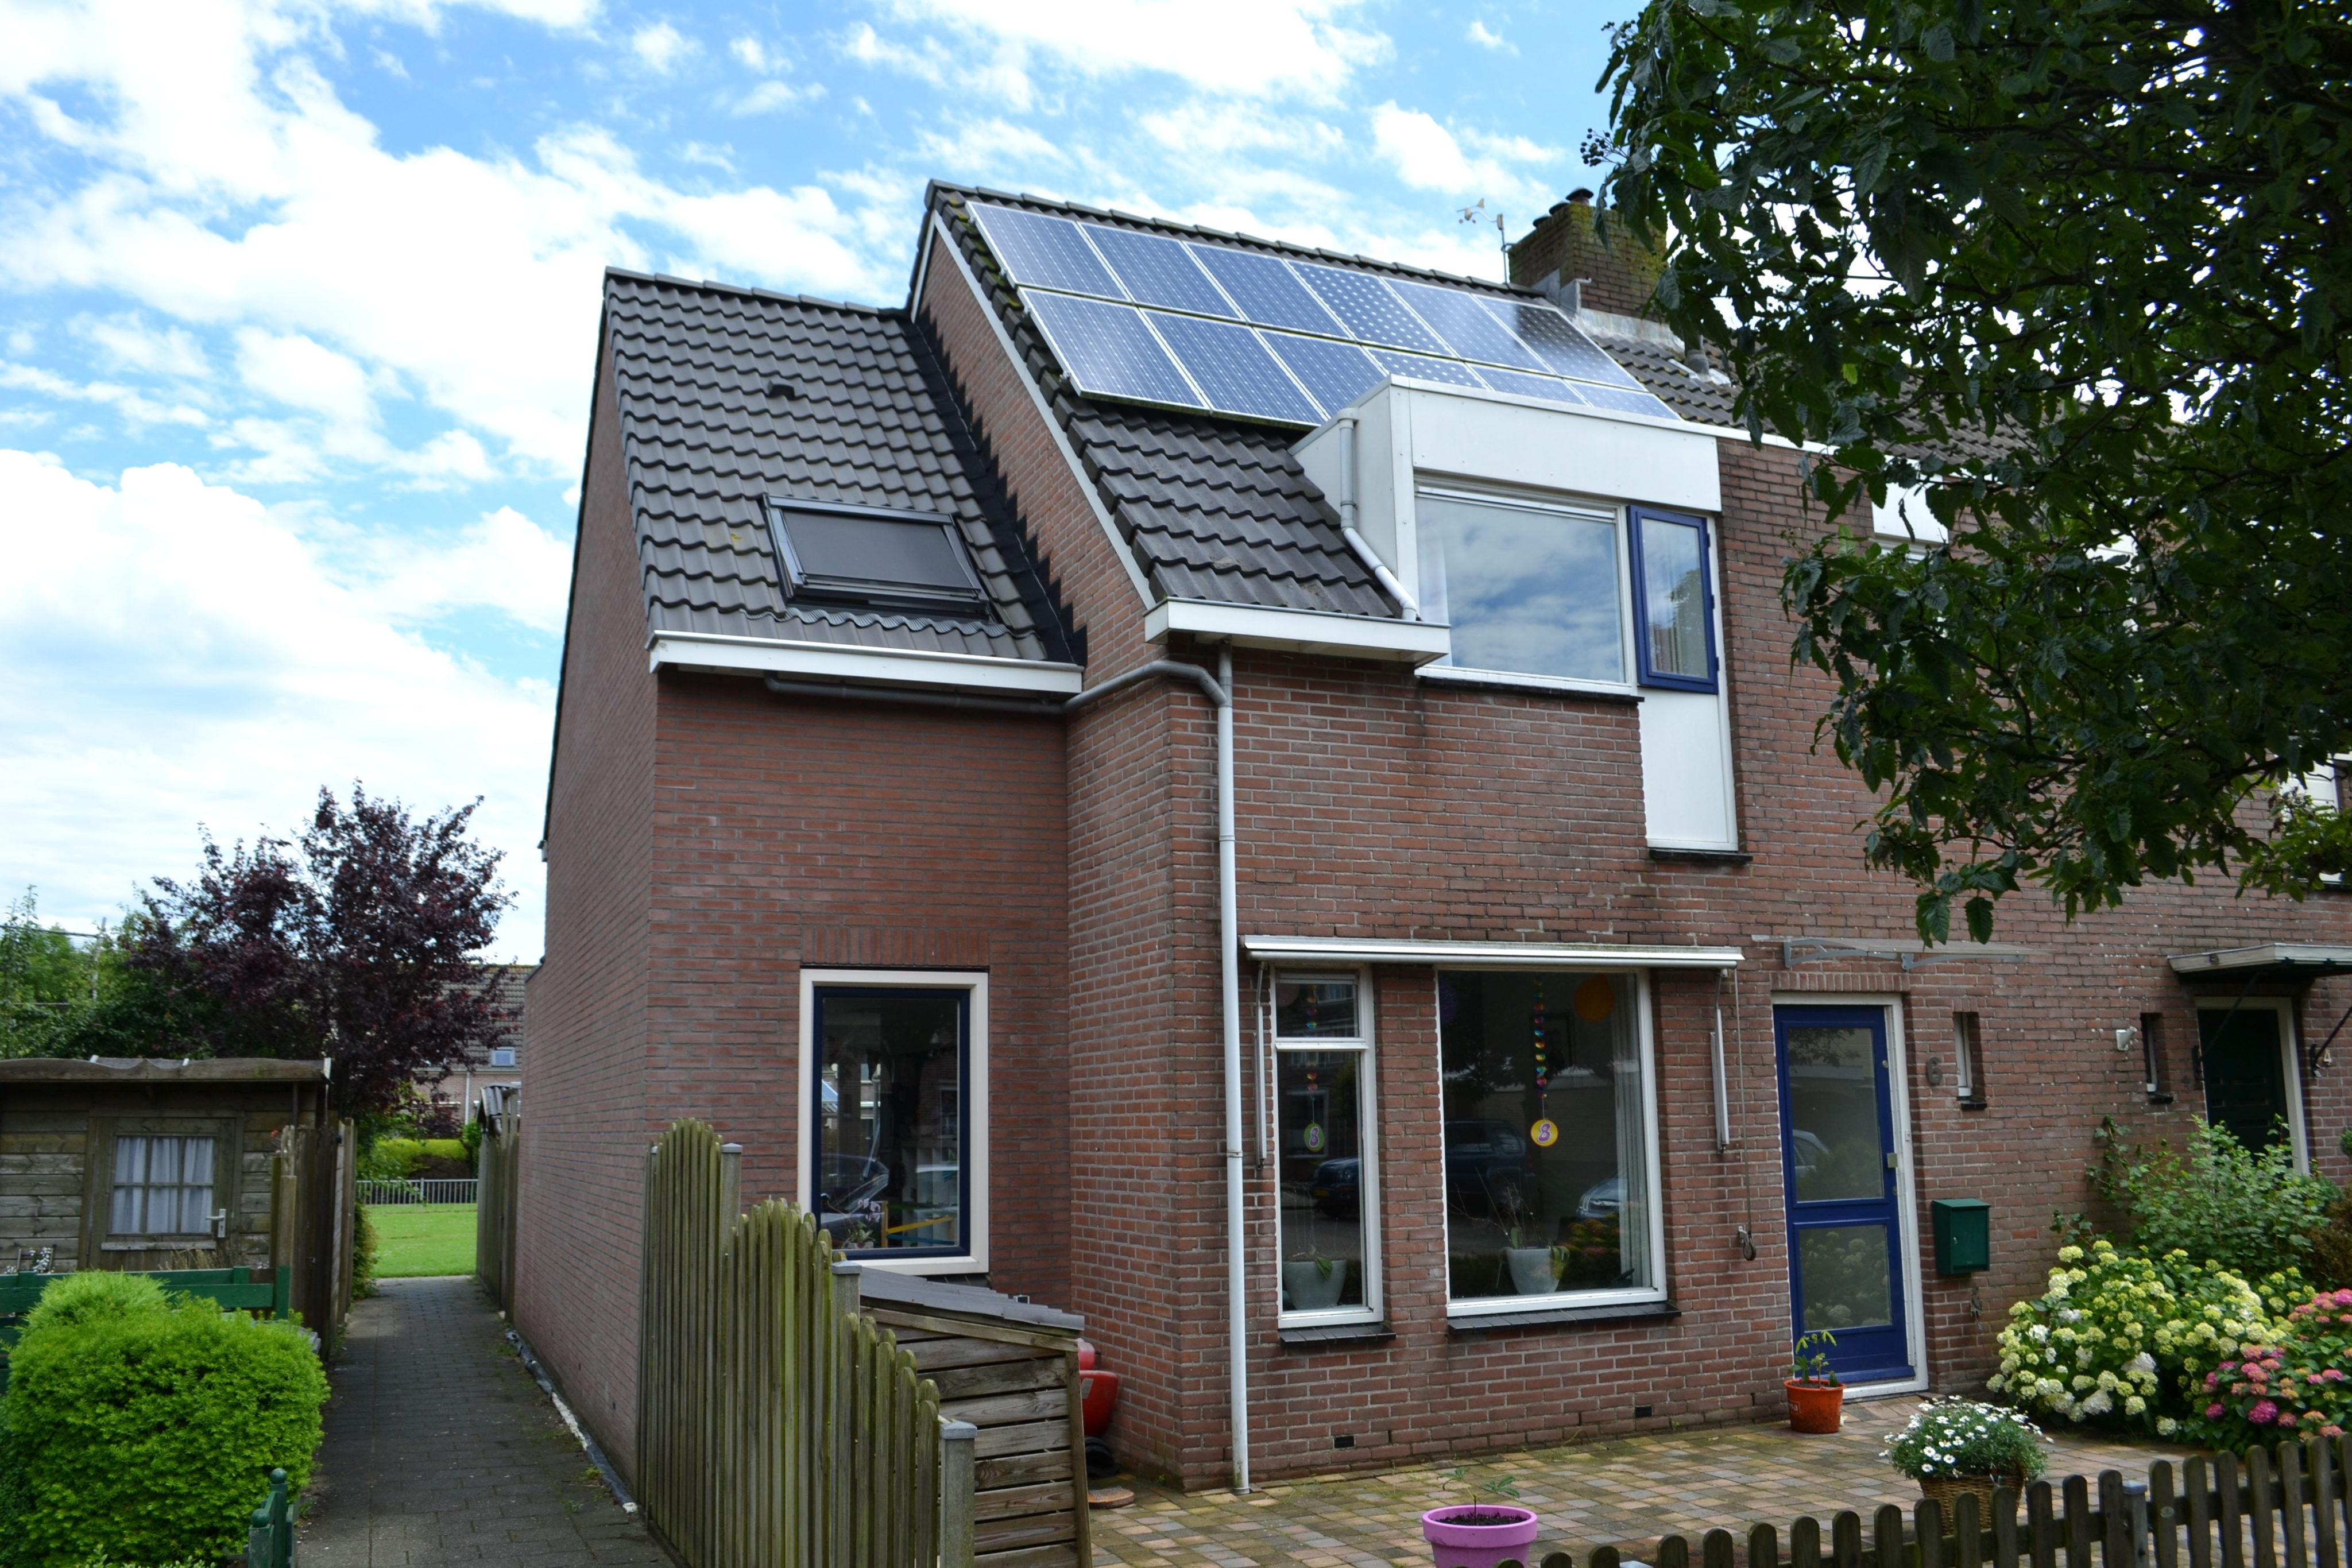 Eerste woning draait gaskraan dicht na hulp Stichting Duurzaam Waterland